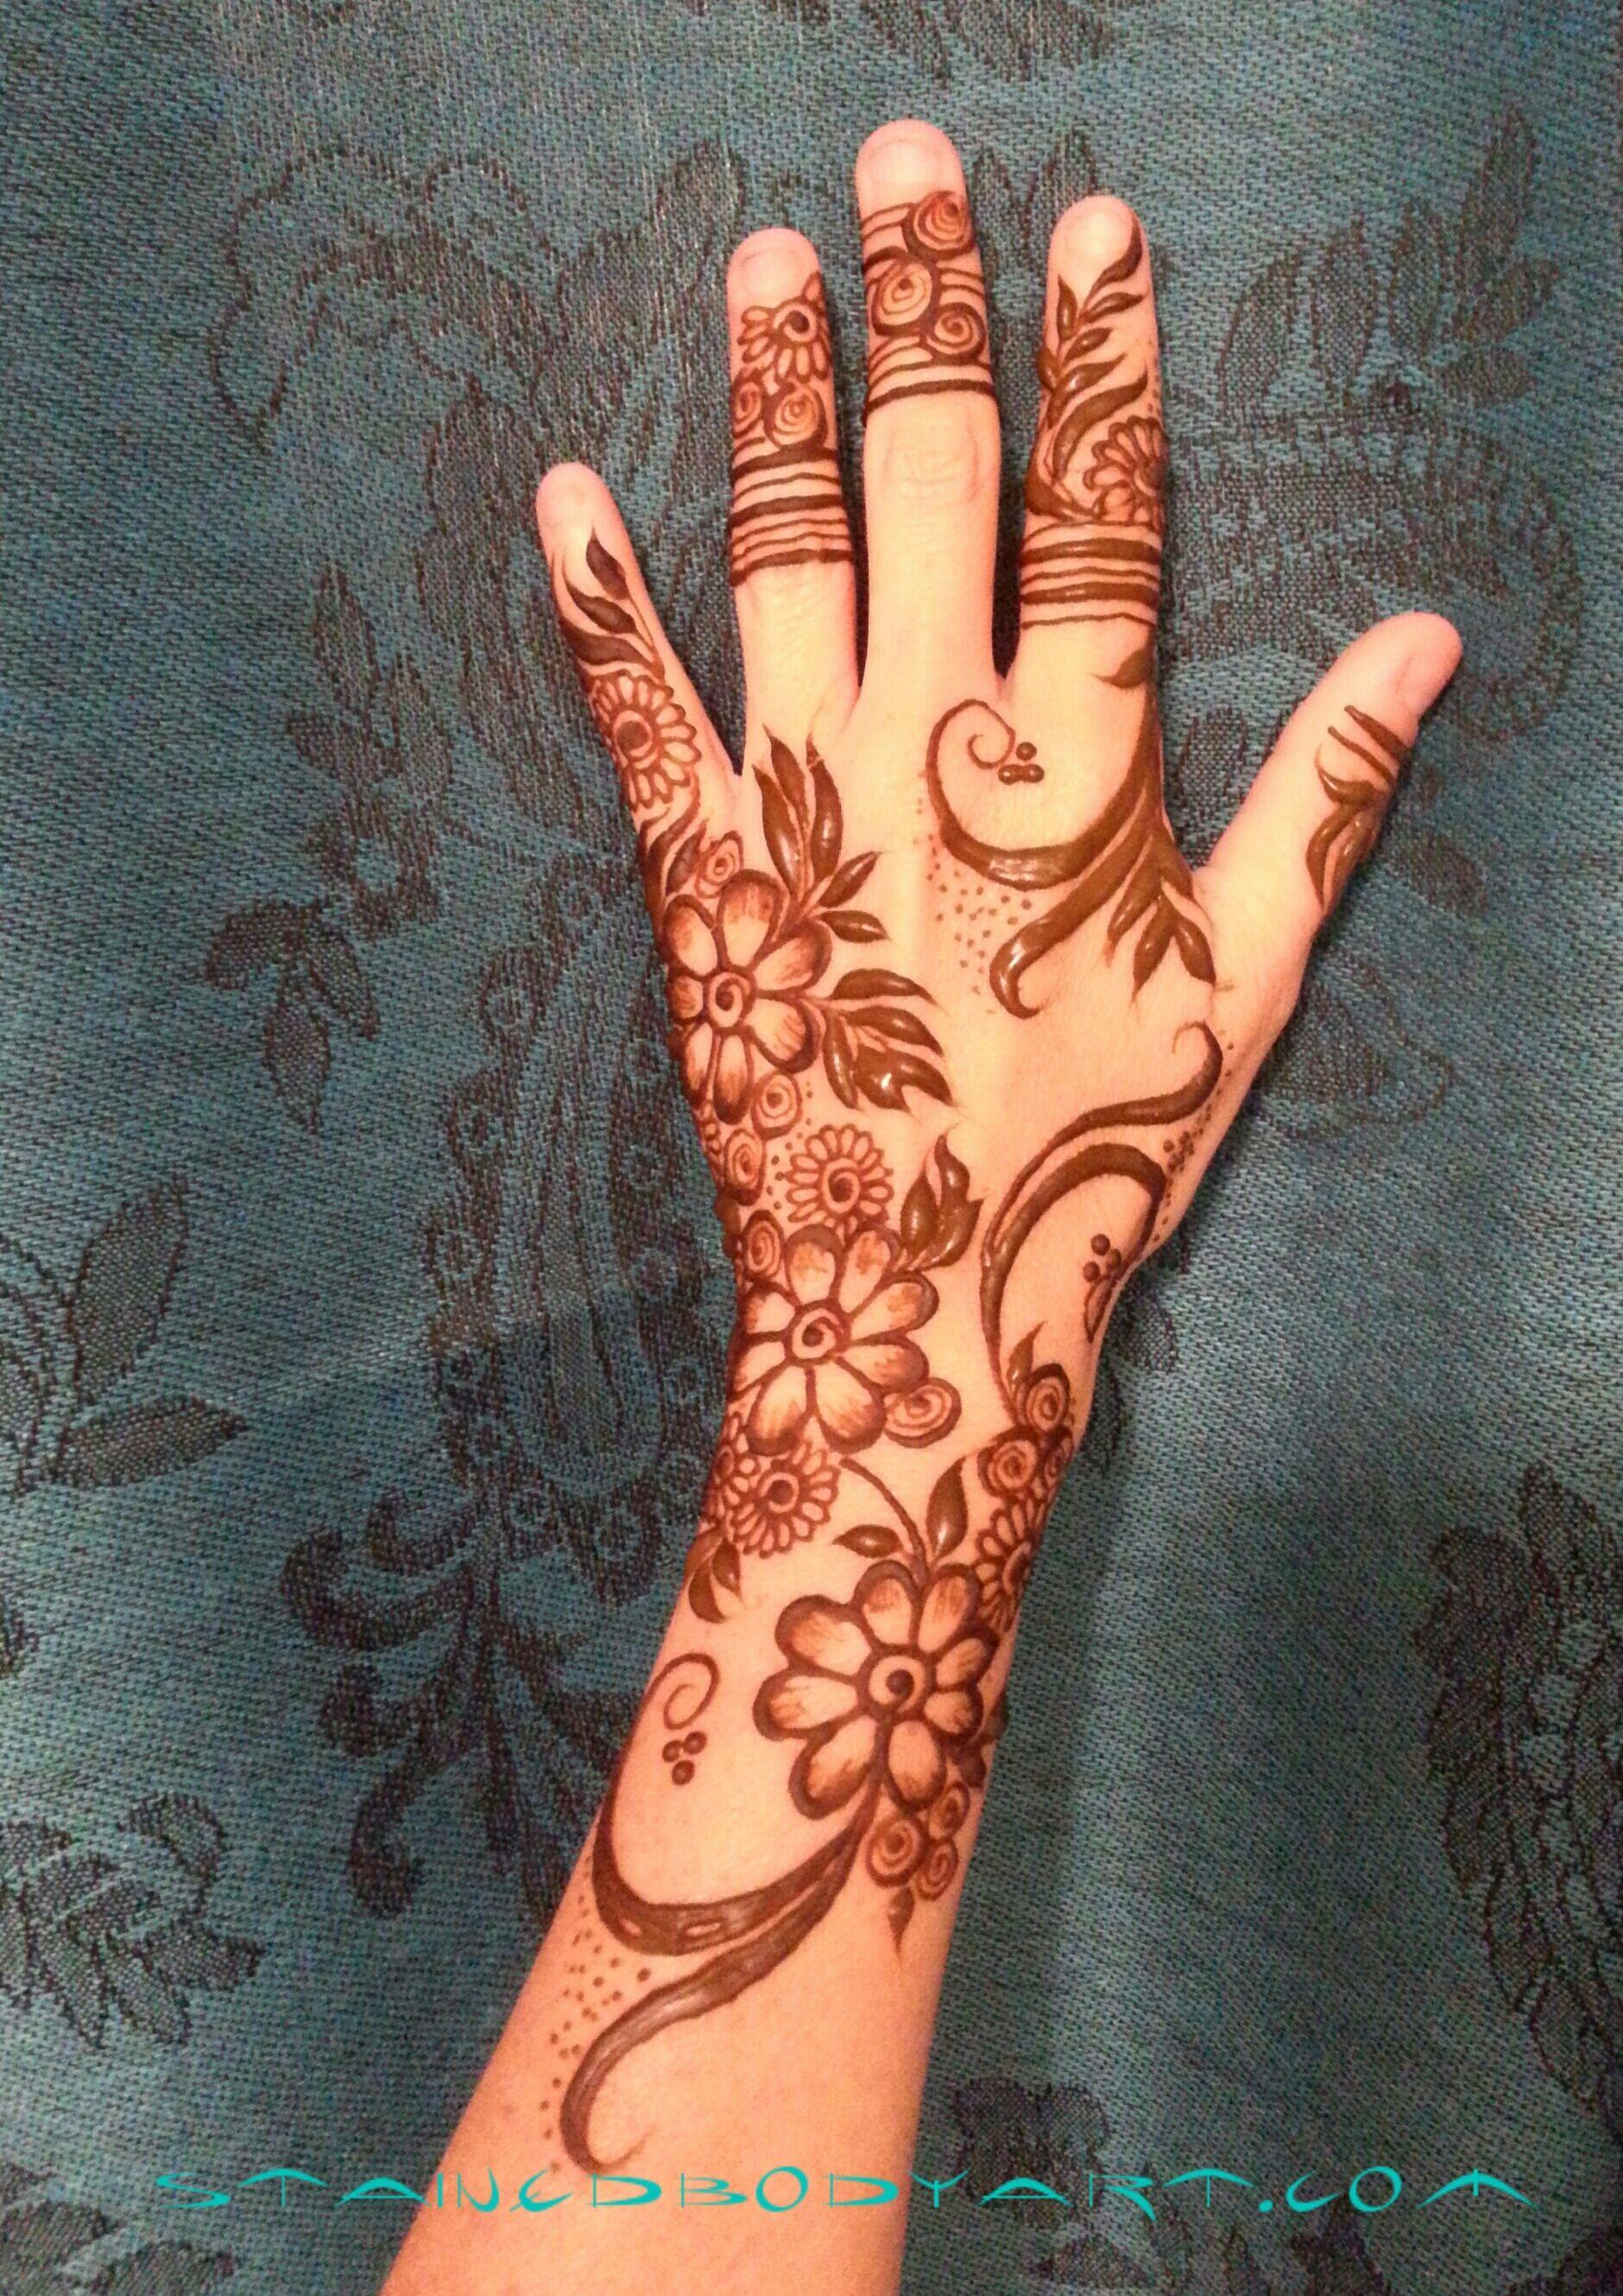 Gulf Khaleeji Style Henna Mehndi Girly 7enna 2019 Henna